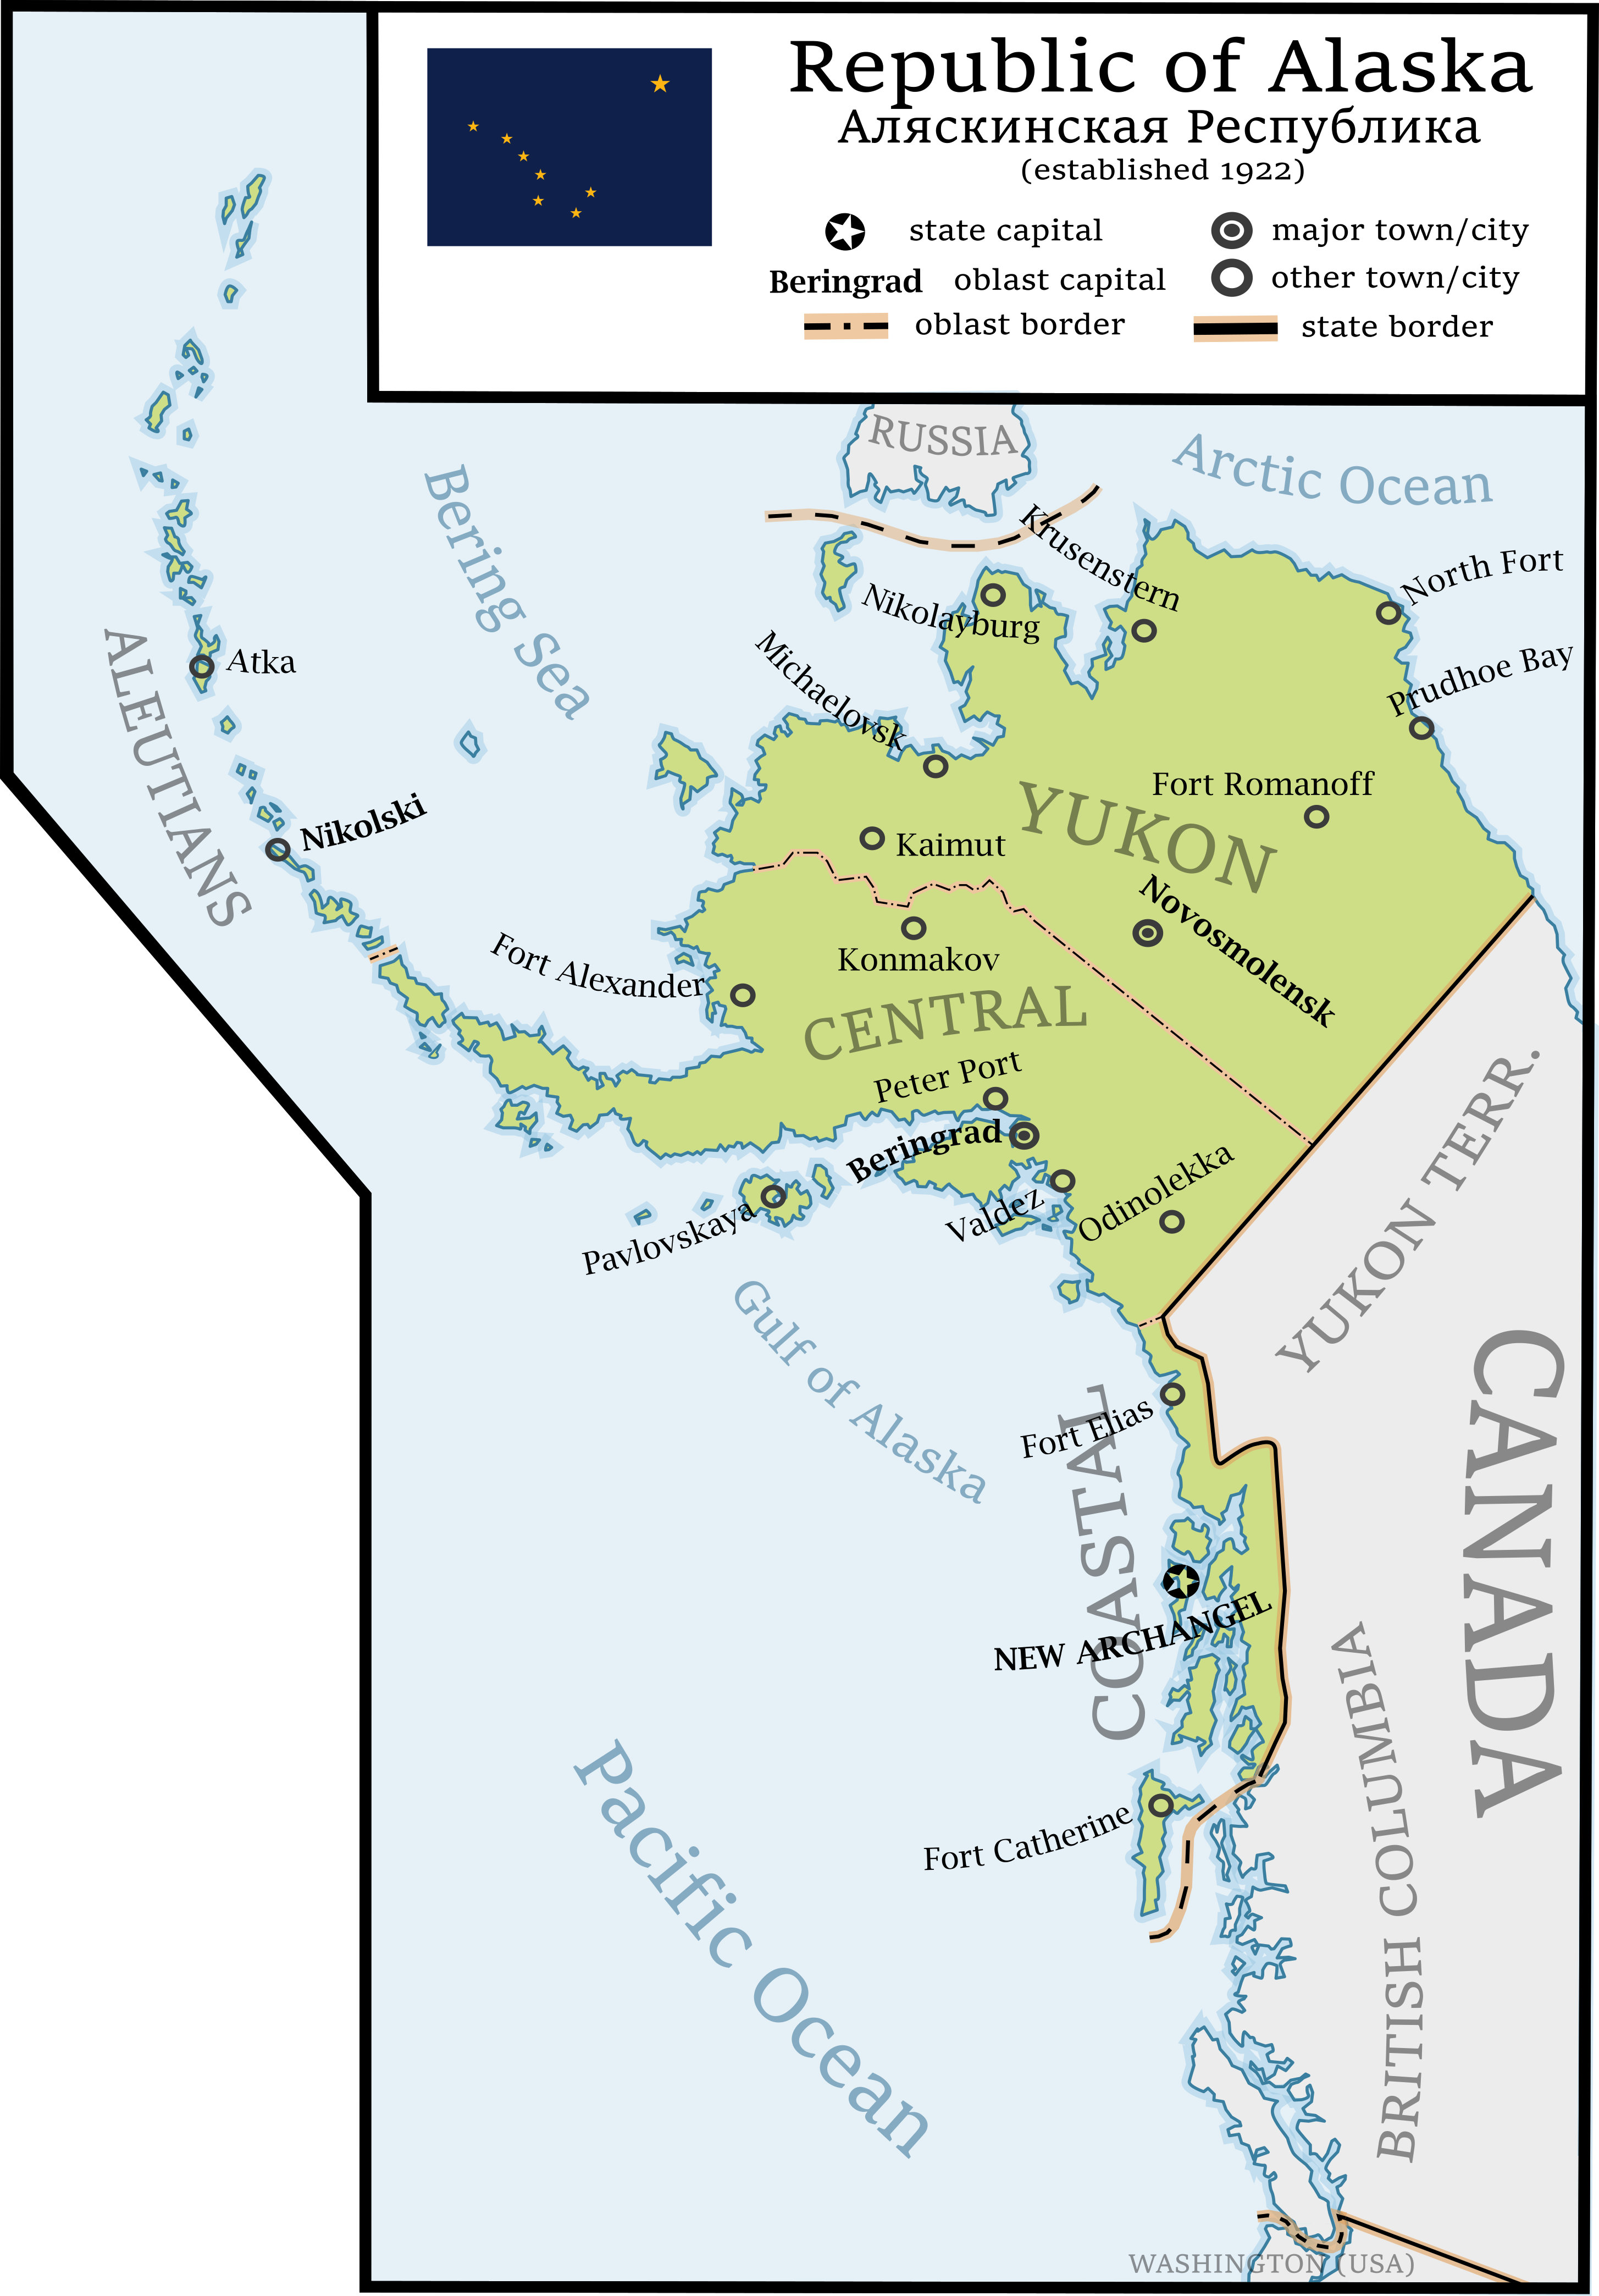 AH - Alaskan Republic by Dom-Bul